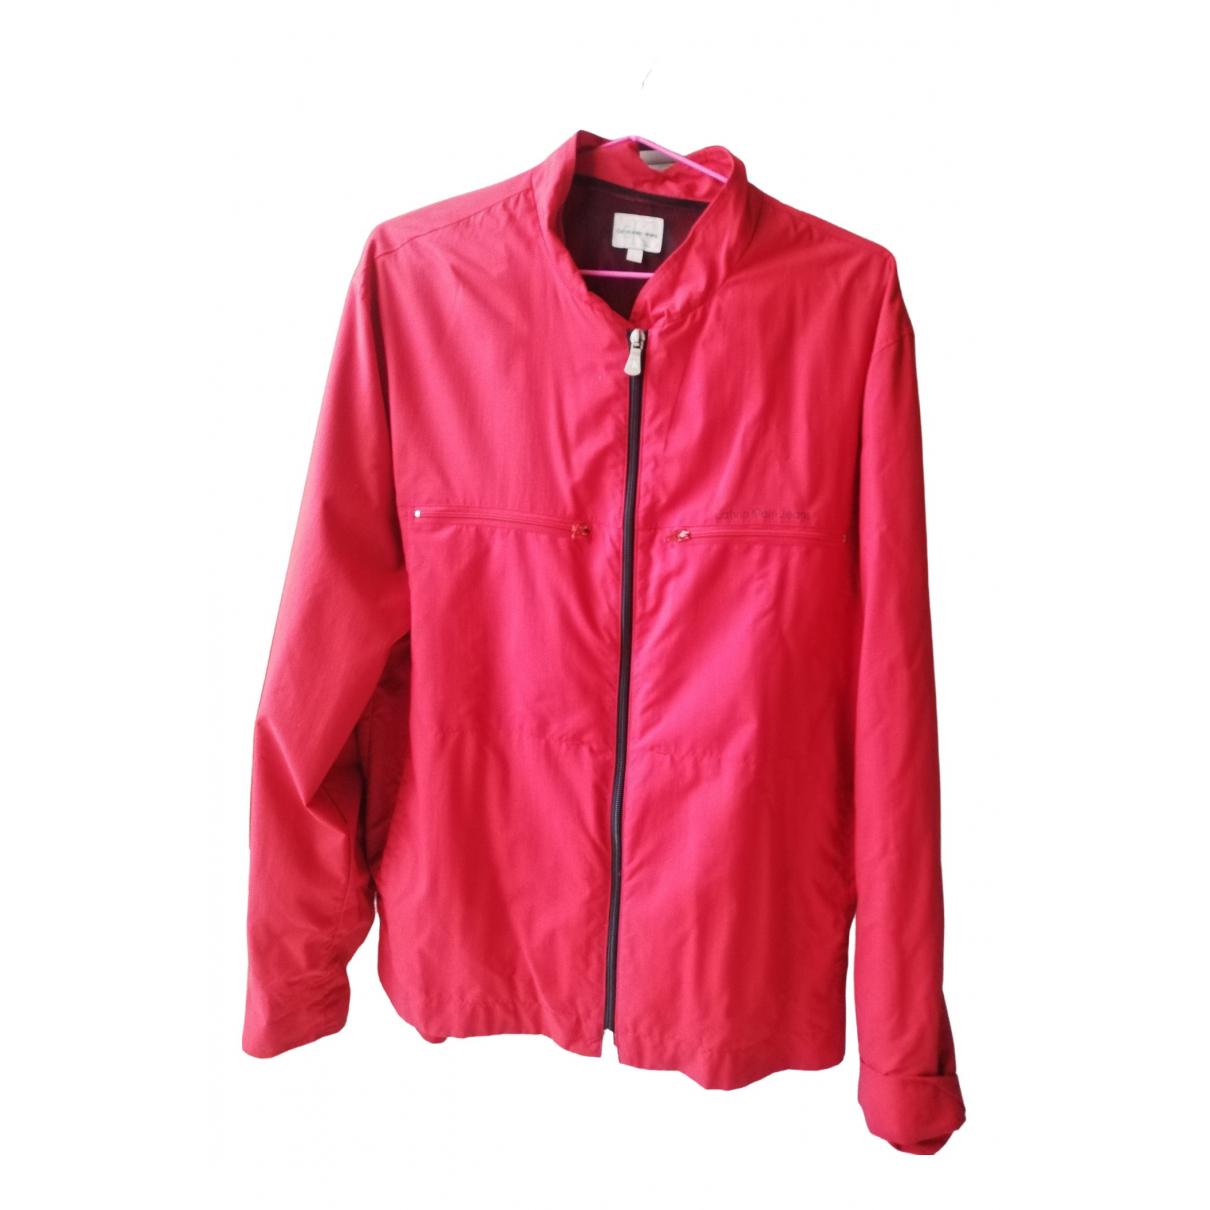 Calvin Klein \N Red jacket  for Men L International